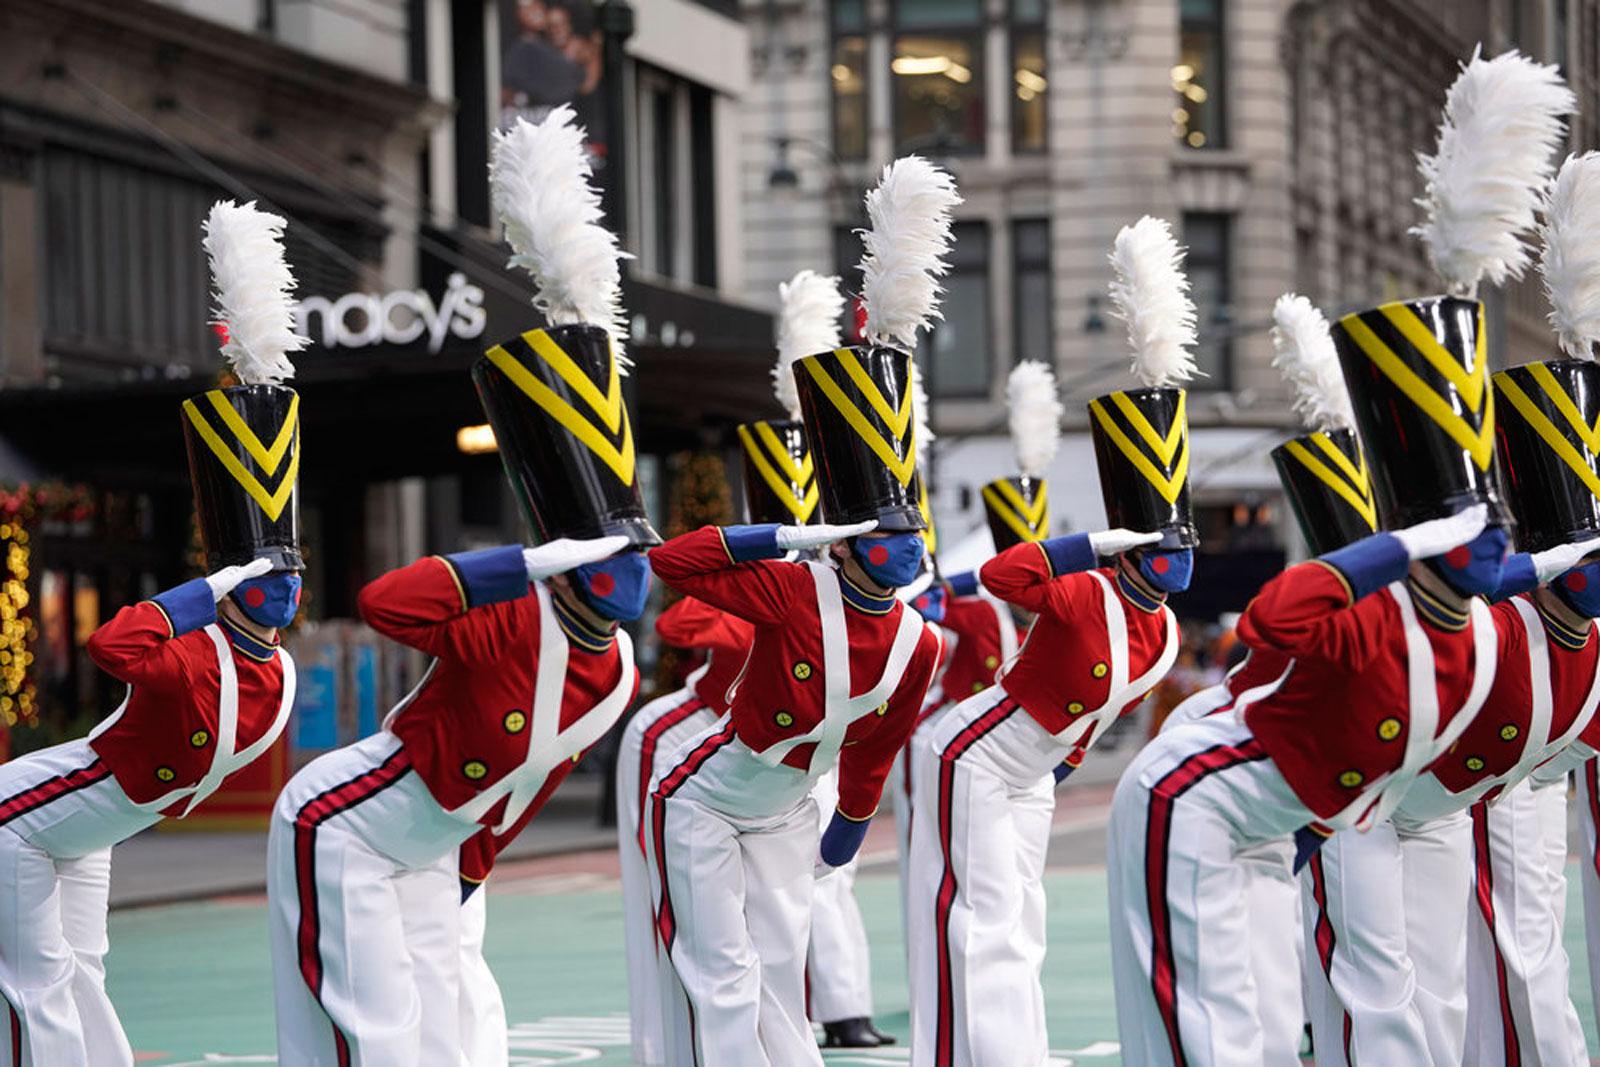 Rockettes perform at Thanksgiving Parade while wearing masks